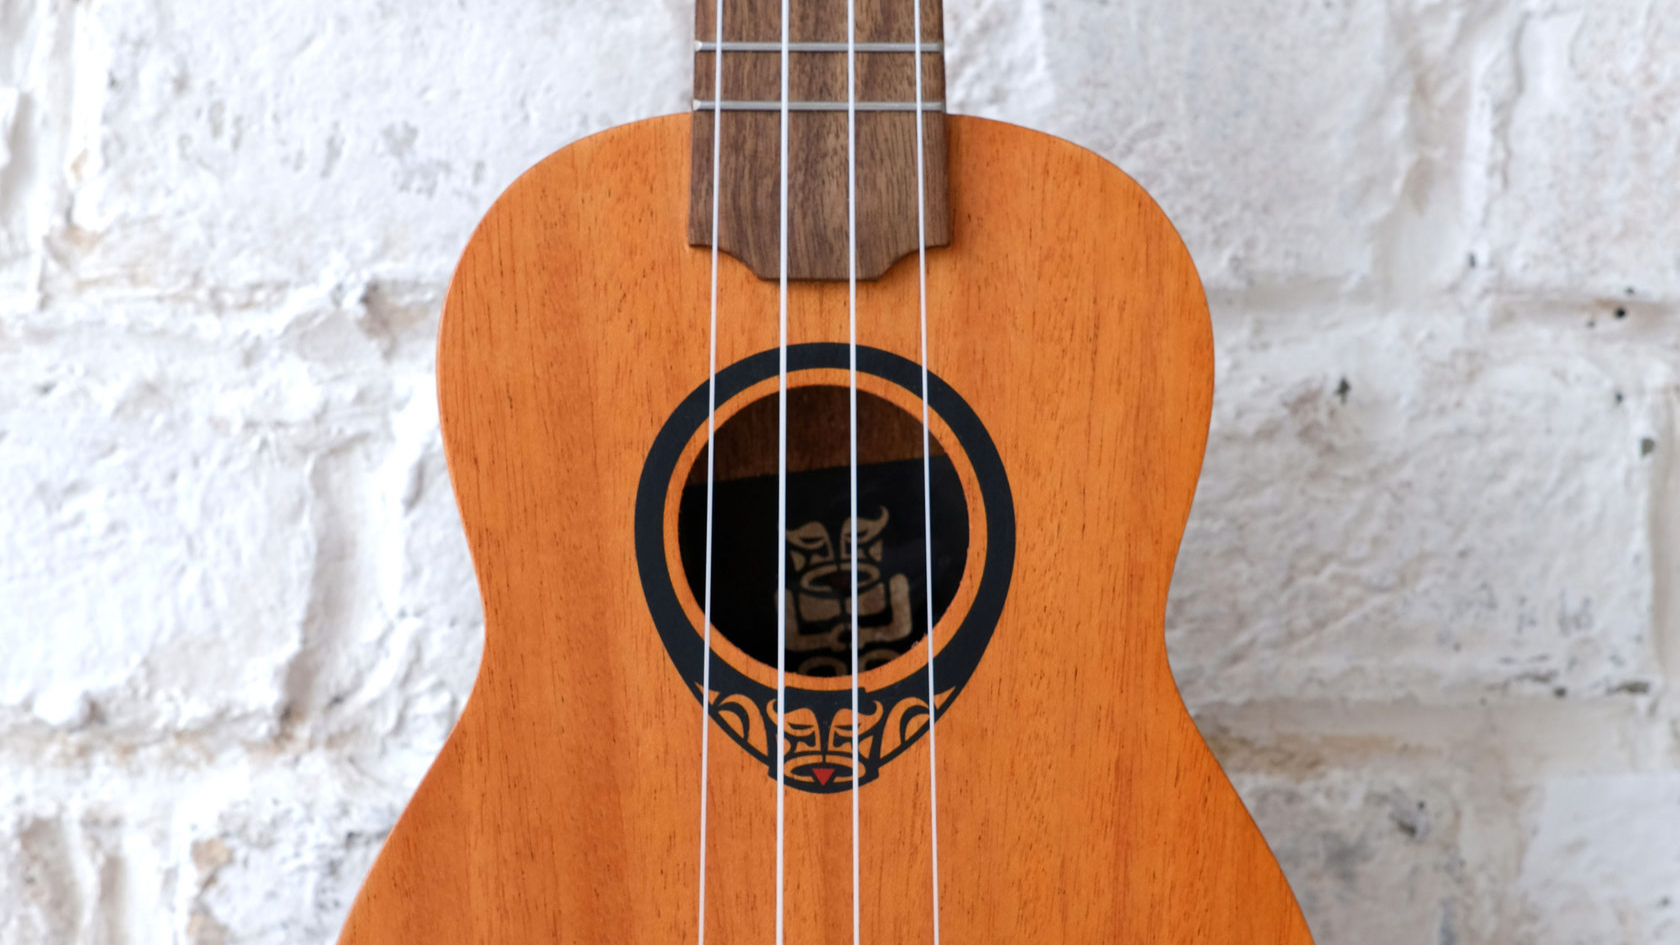 Купить укулеле сопрано BABY LAG TKU110S в магазине ukelovers, ukulele LAG, travel ukulele